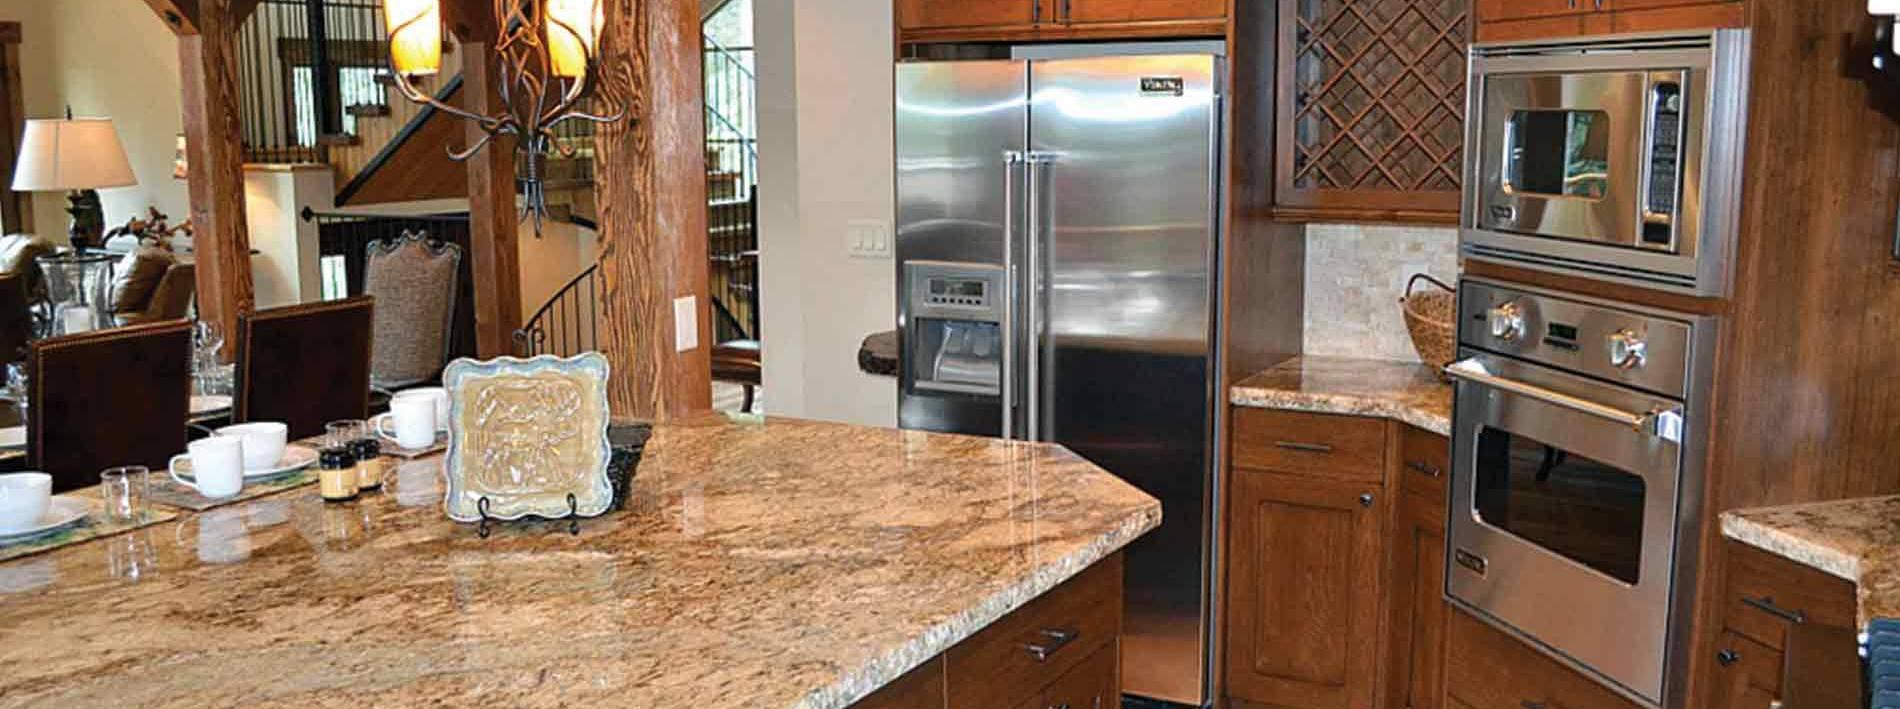 Jackson Hole Blue Moose lodge spacious kitchen